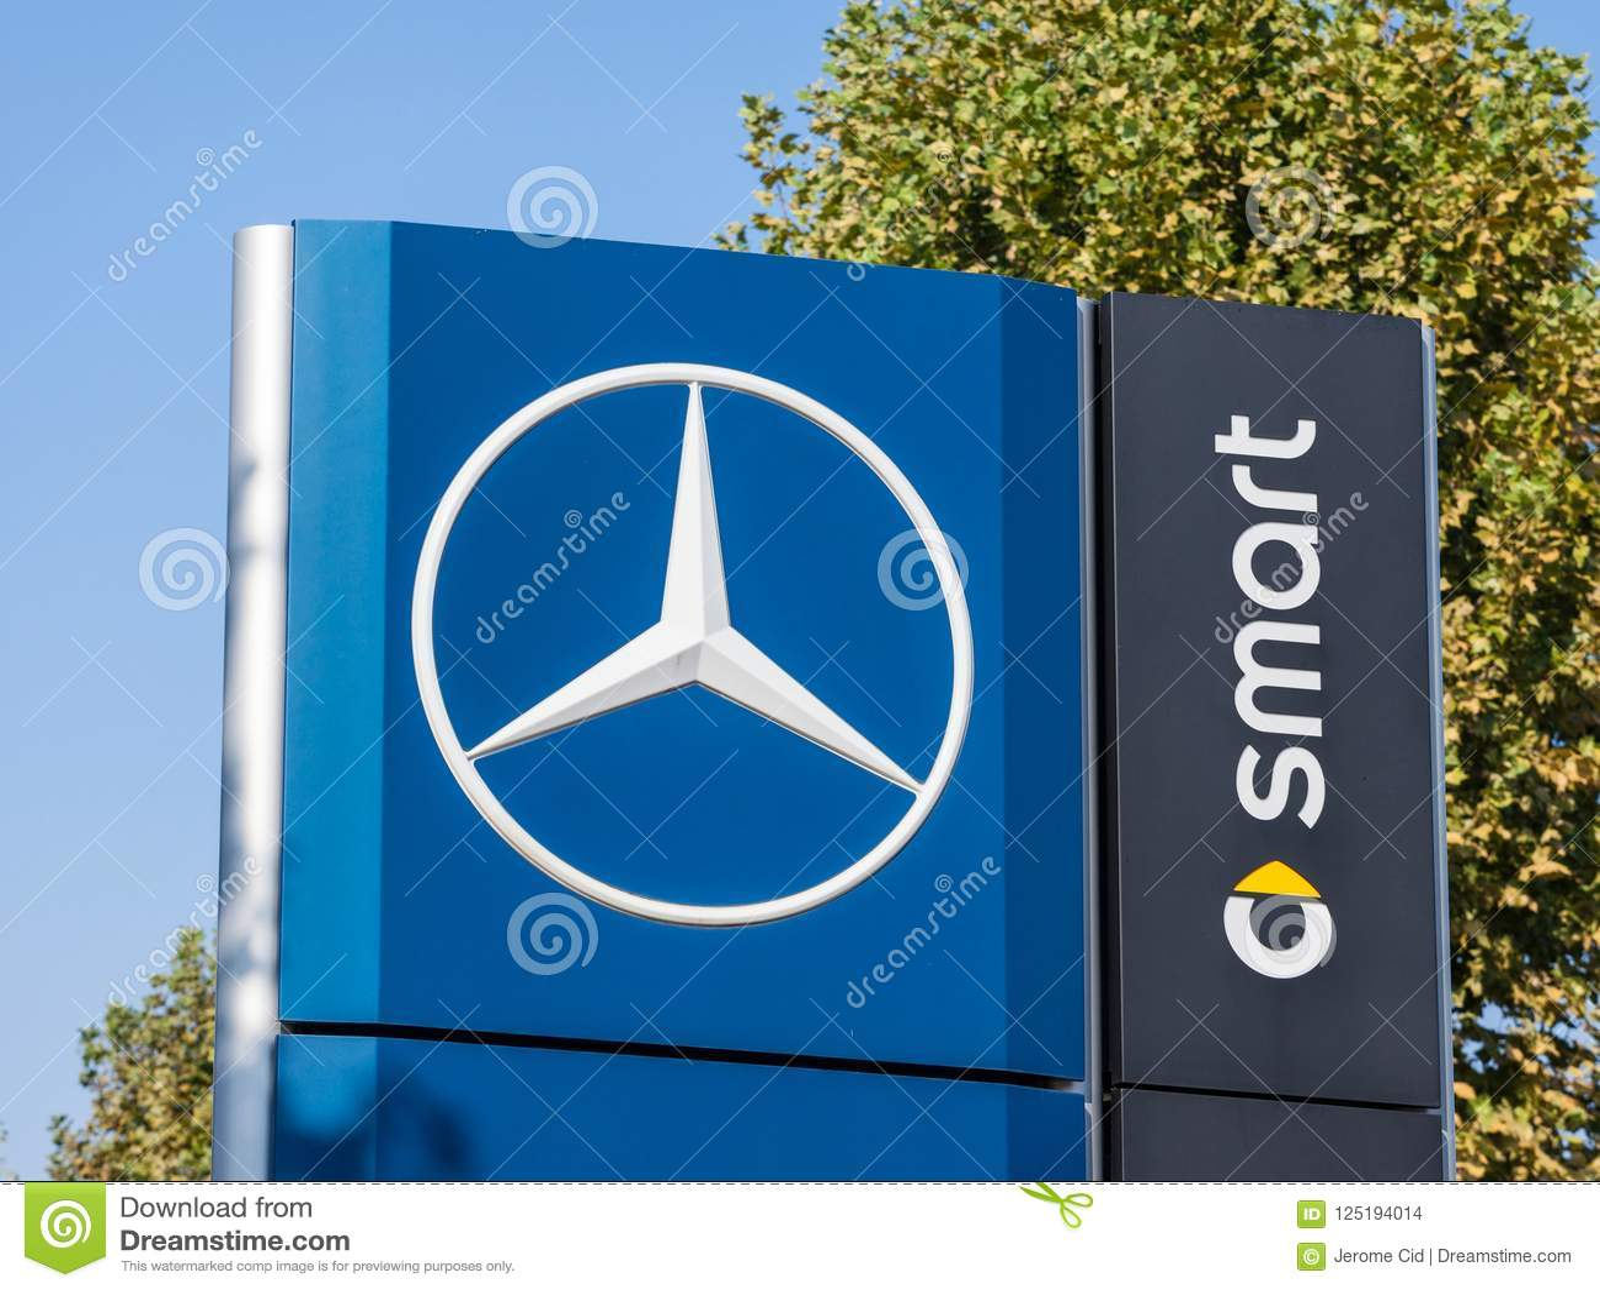 Mercedes Benz Logo On Their Main Dealership Store Belgrade Part Of